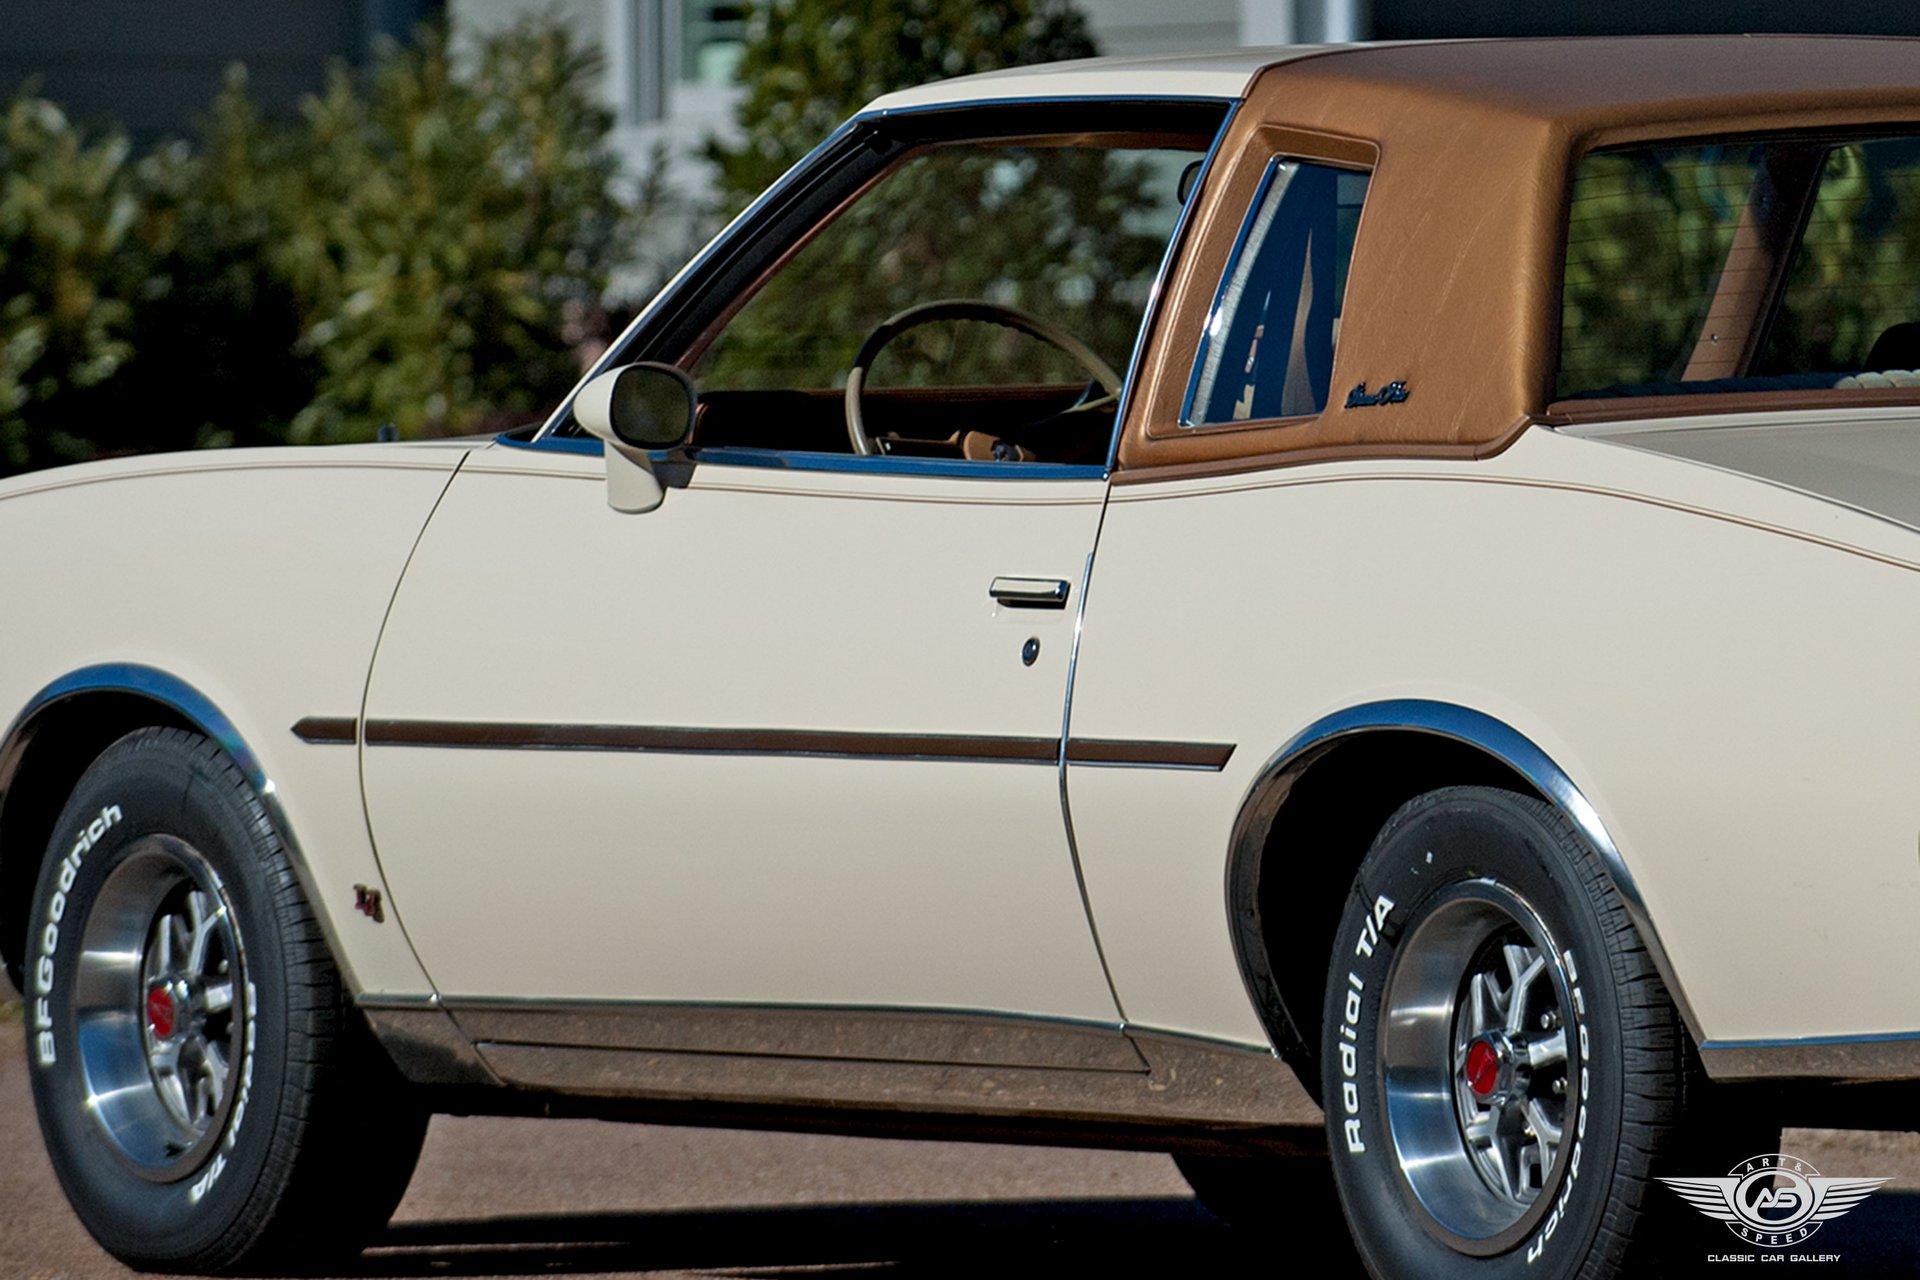 1980 Pontiac Grand Prix   Art & Speed Classic Car Gallery in Memphis, TN